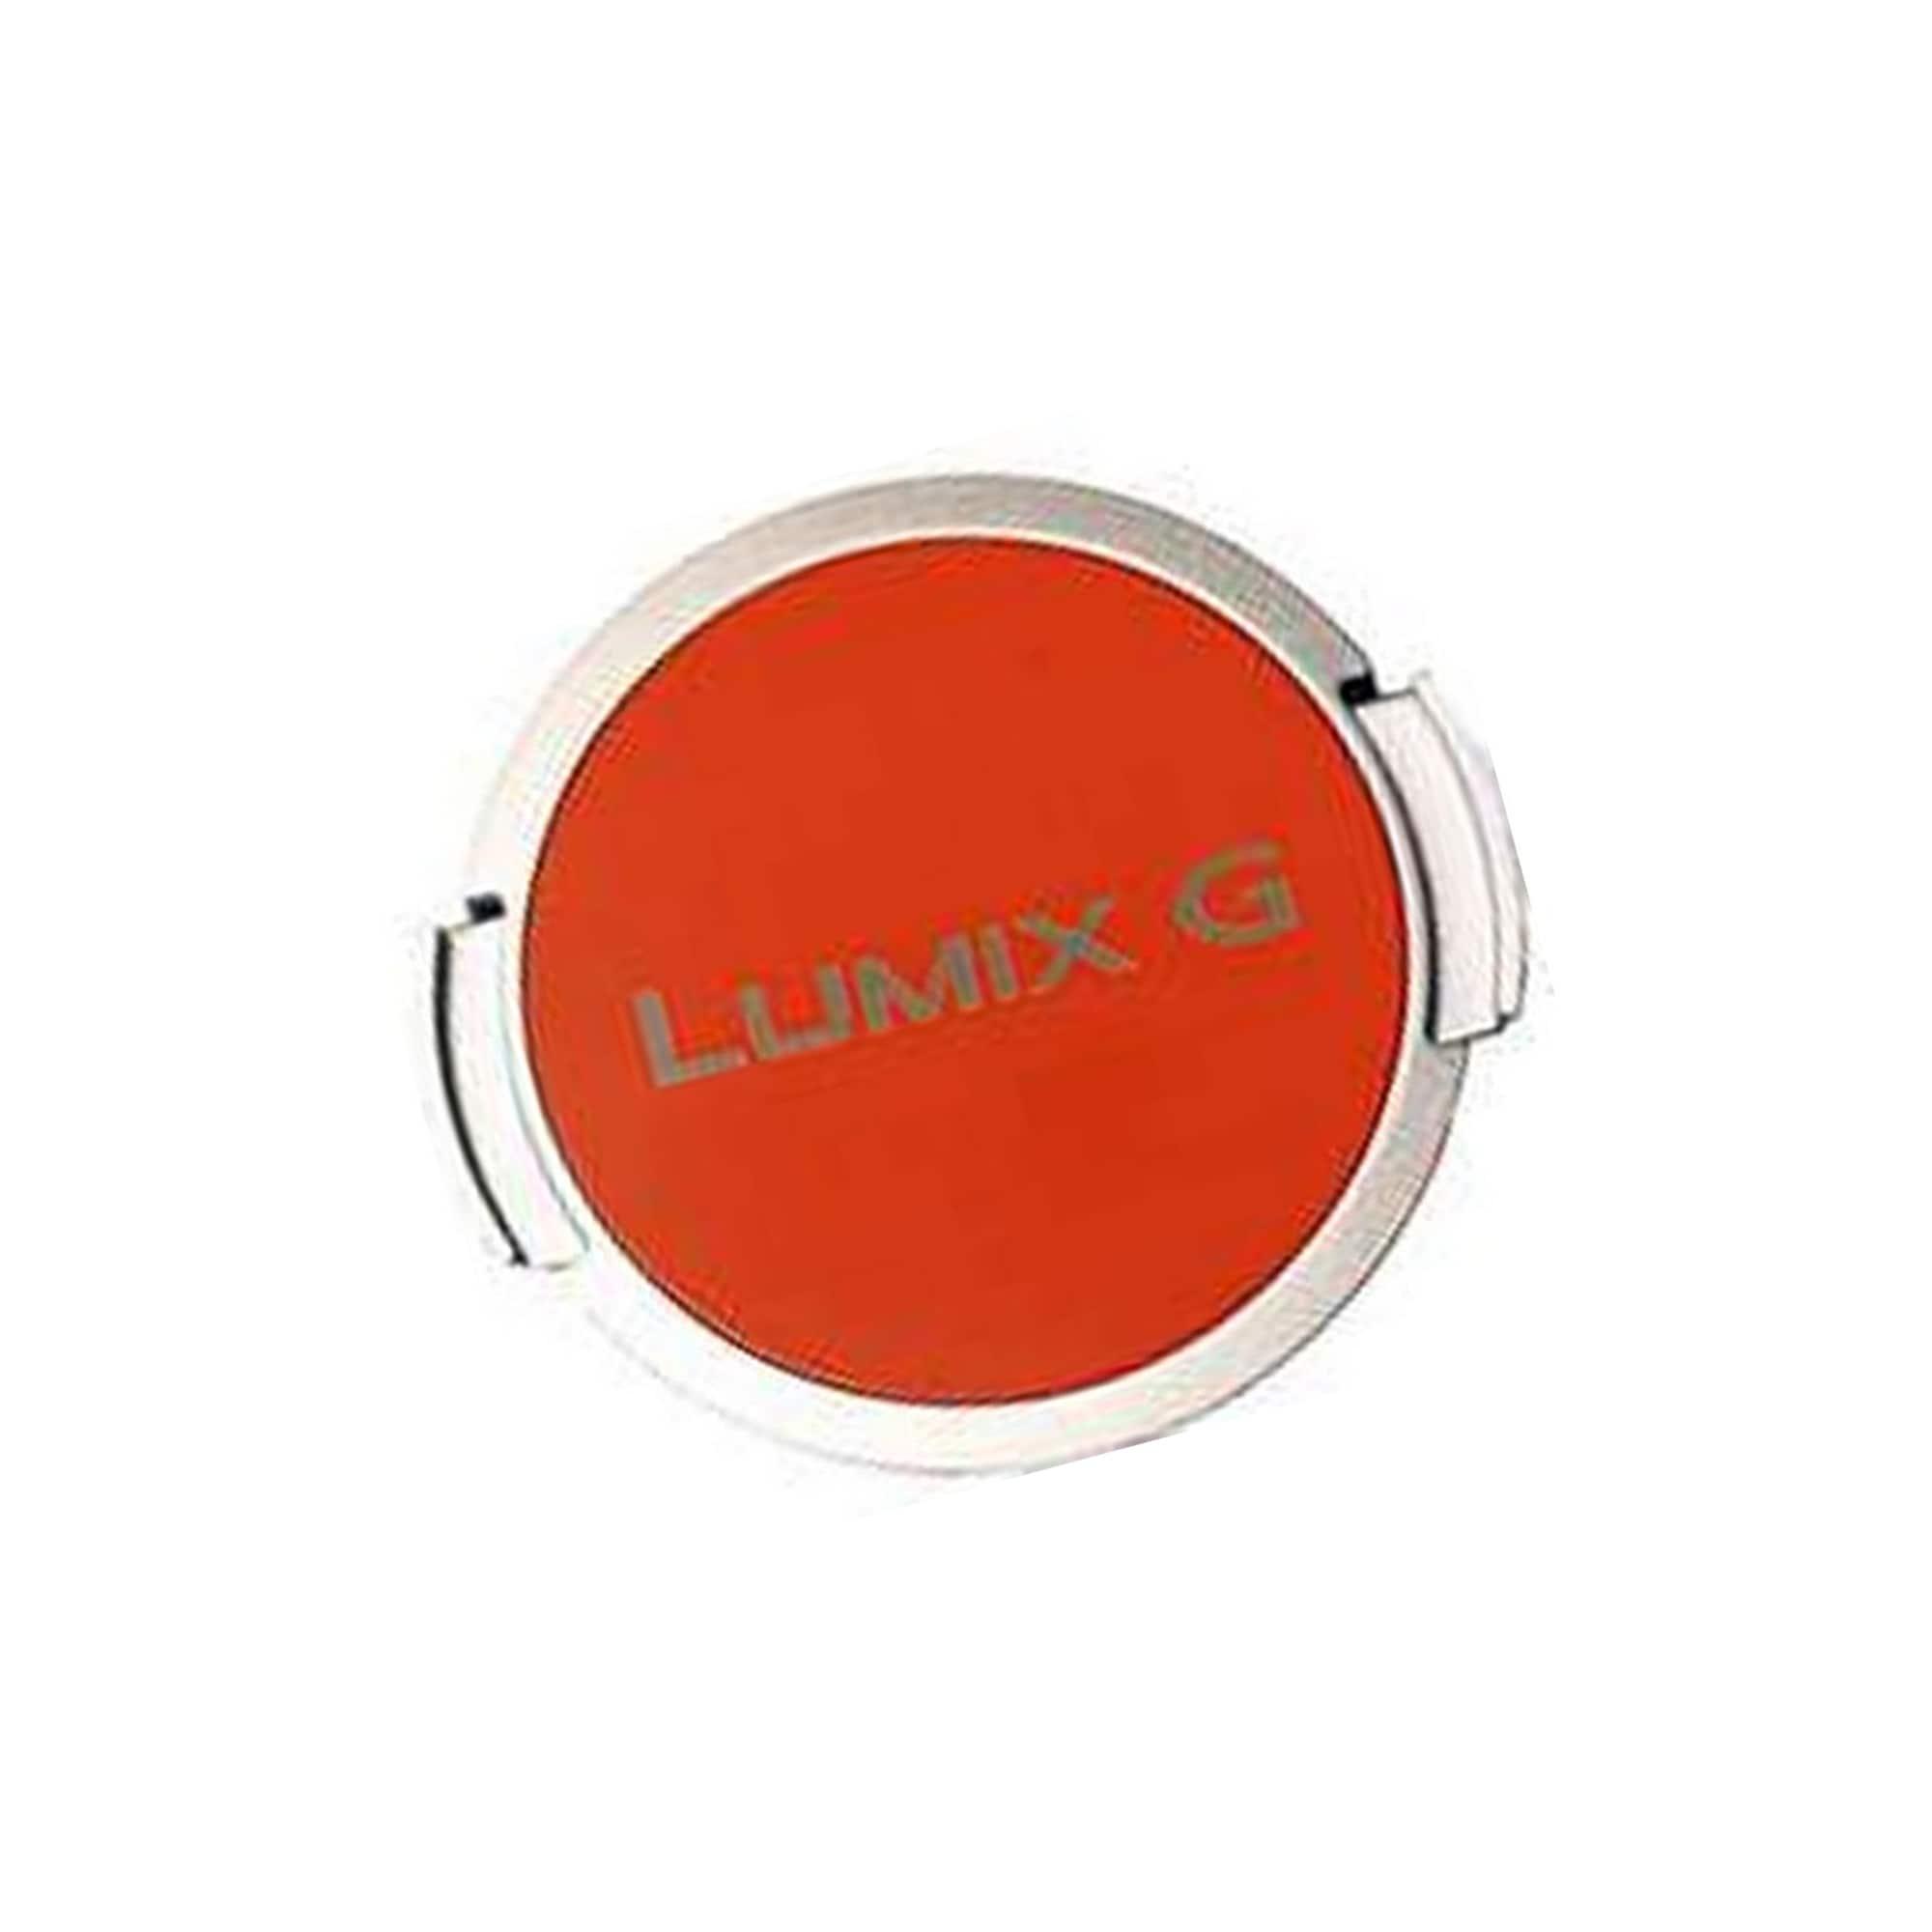 Panasonic DMW-LF37AF 37mm objektiv silver/orange